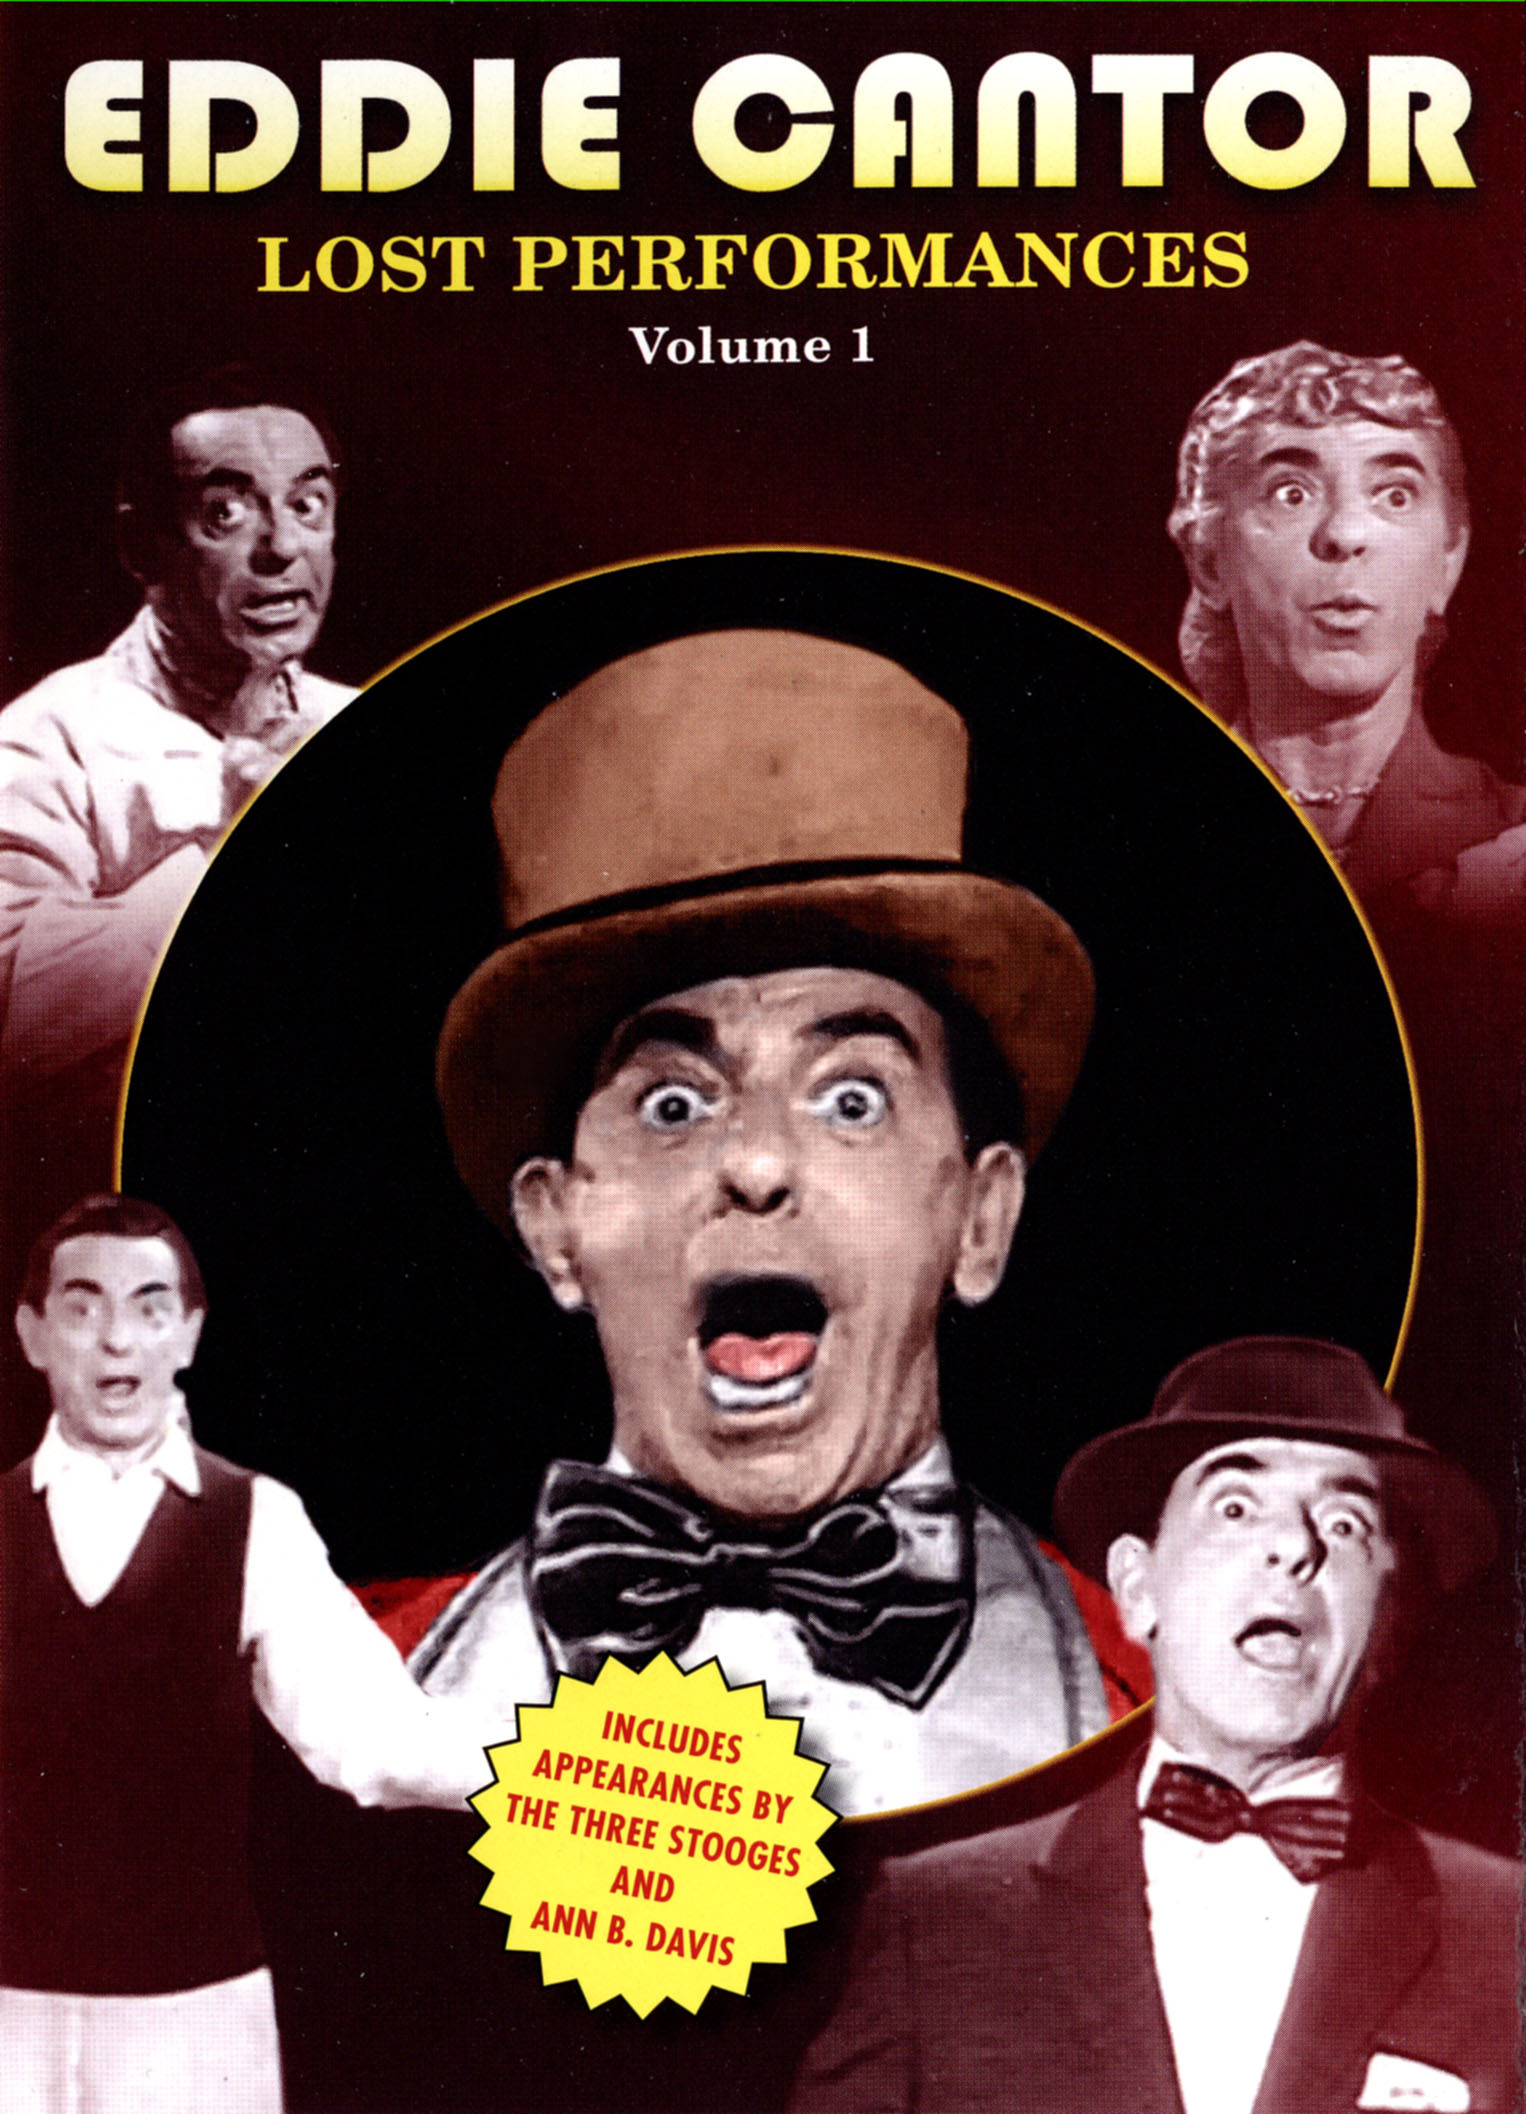 Eddie Cantor: The Lost Performances, Vol.1